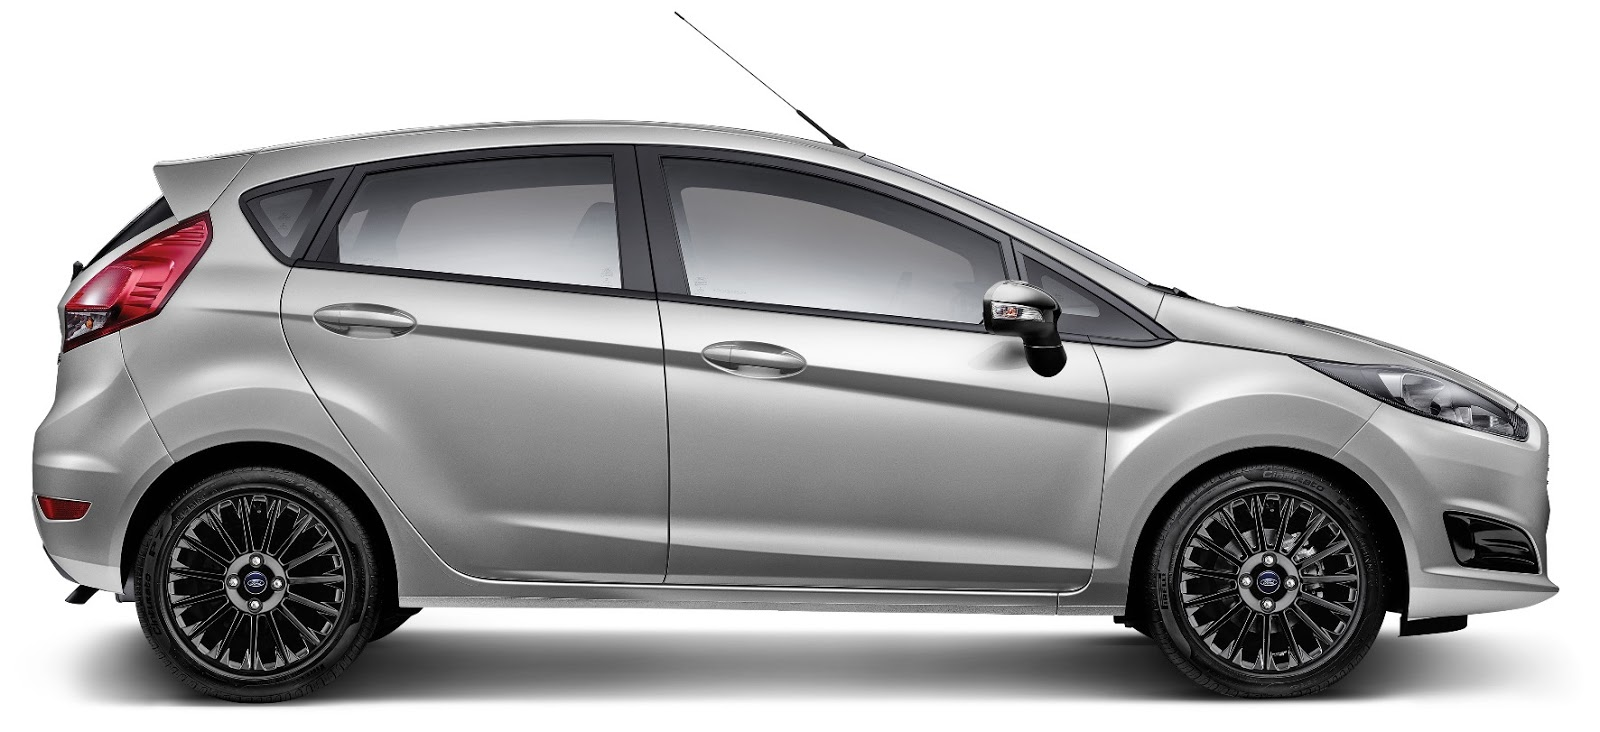 Racionauto Ford Lan 199 A Linha 2017 Do New Fiesta